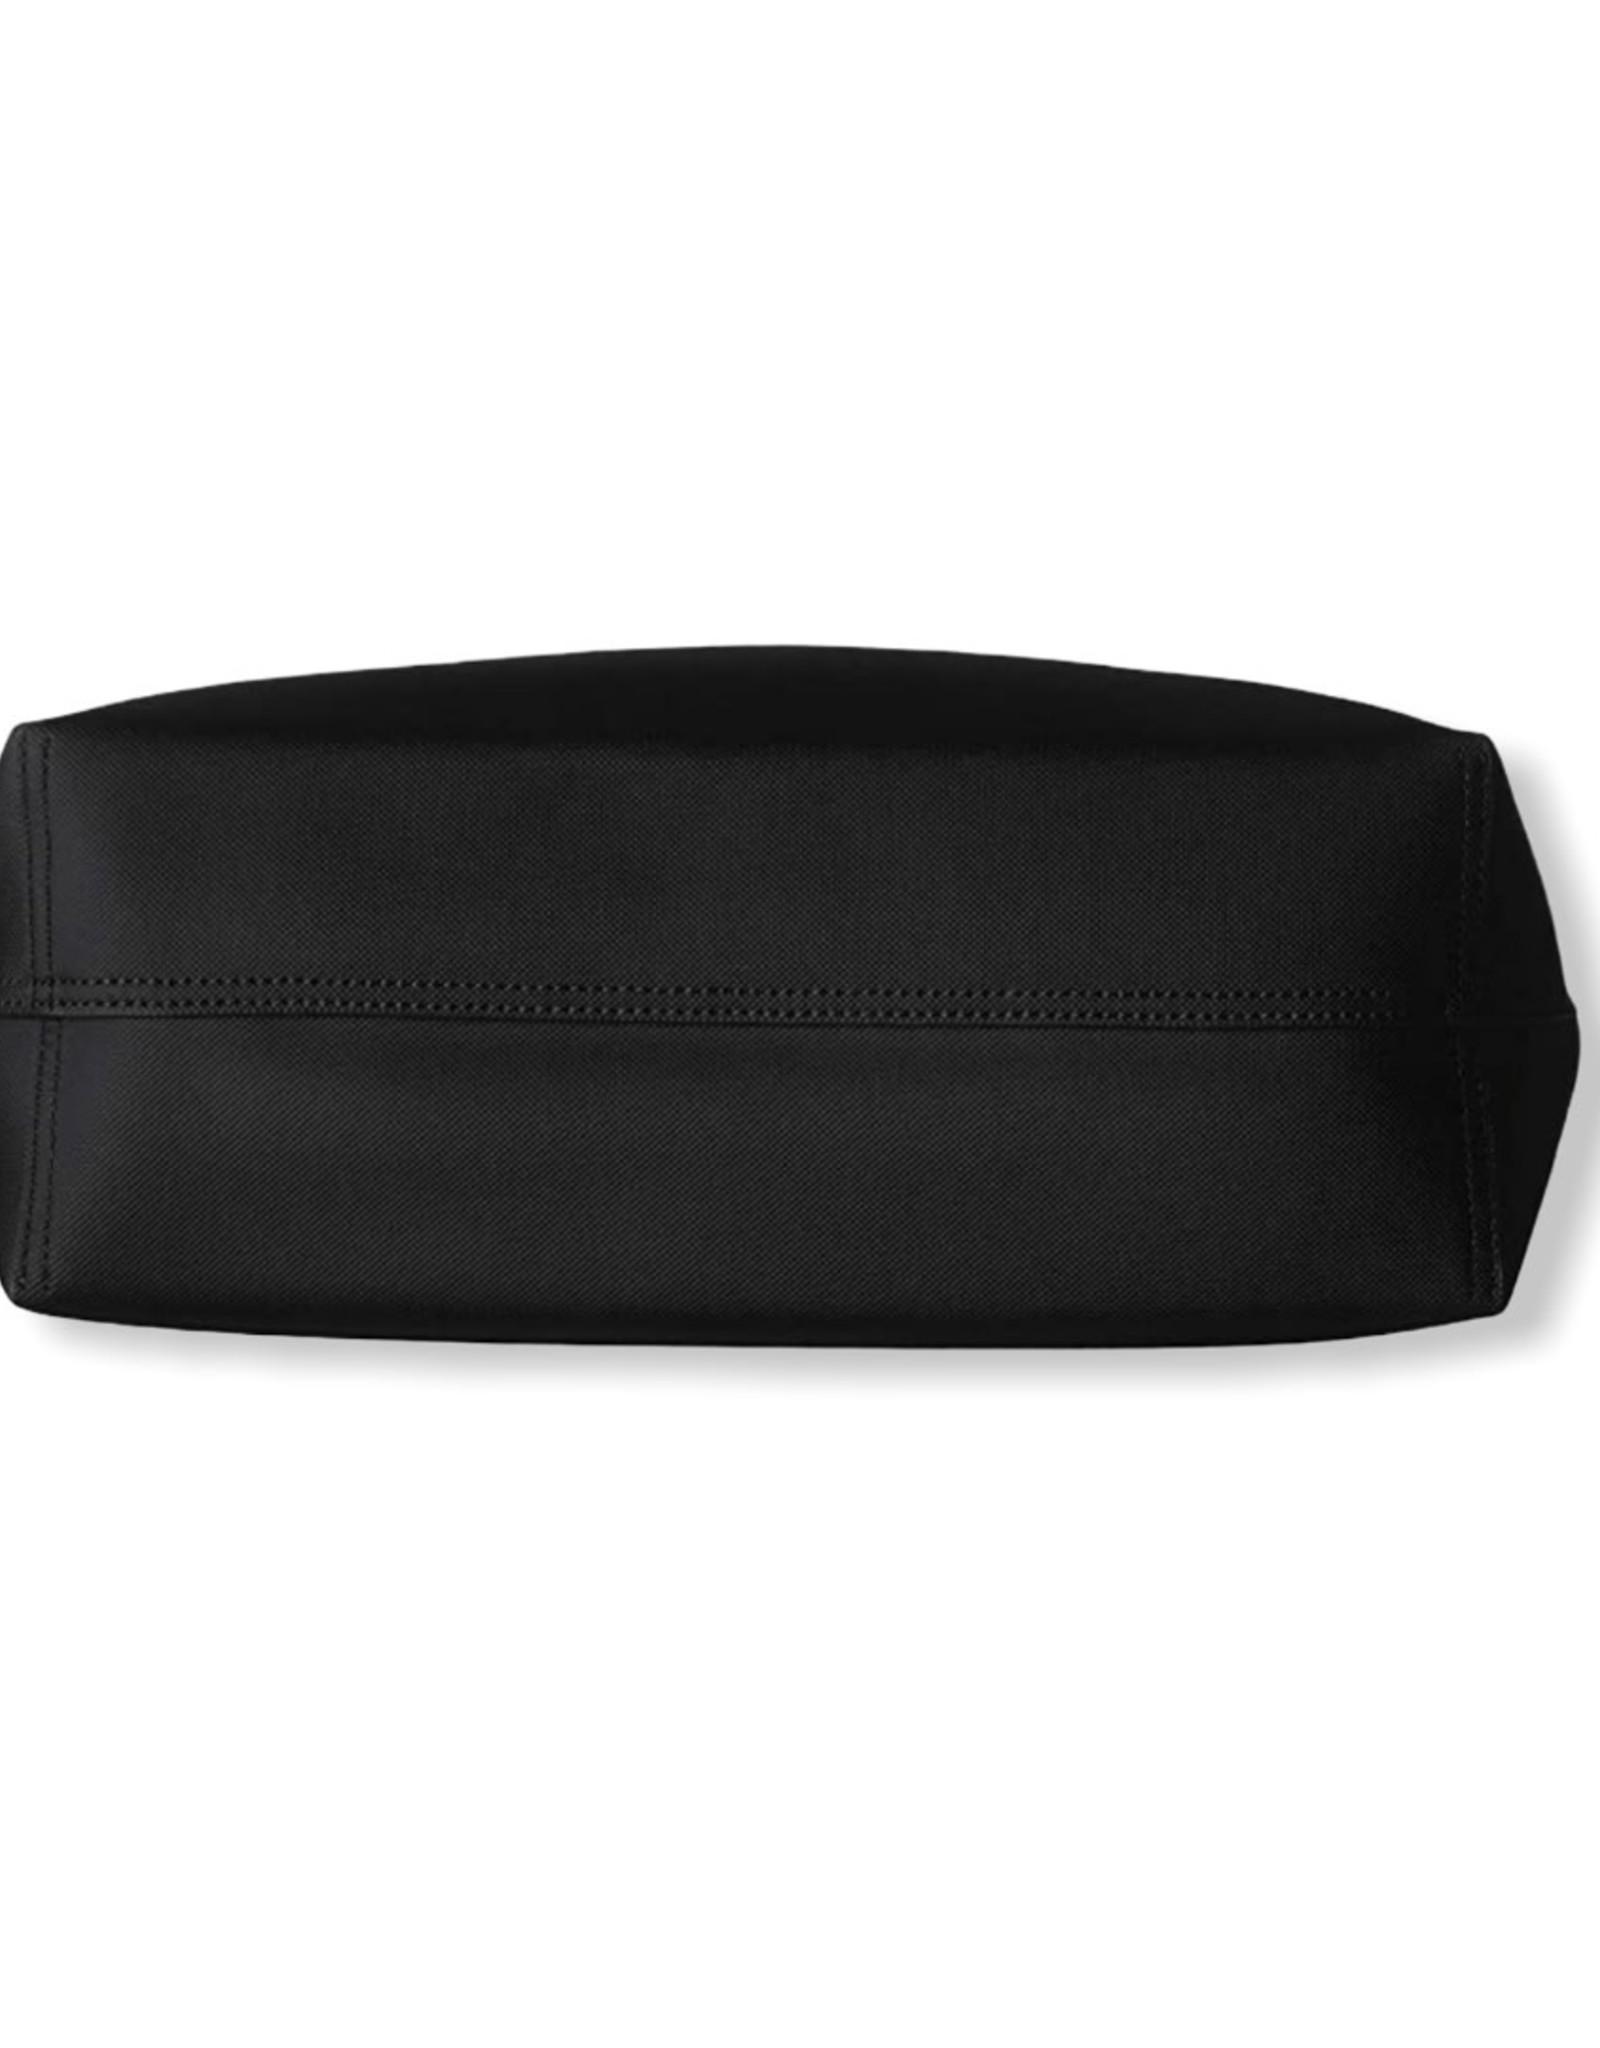 Lacoste Lacoste L Reversible  w/ Pouch Shopping Bag